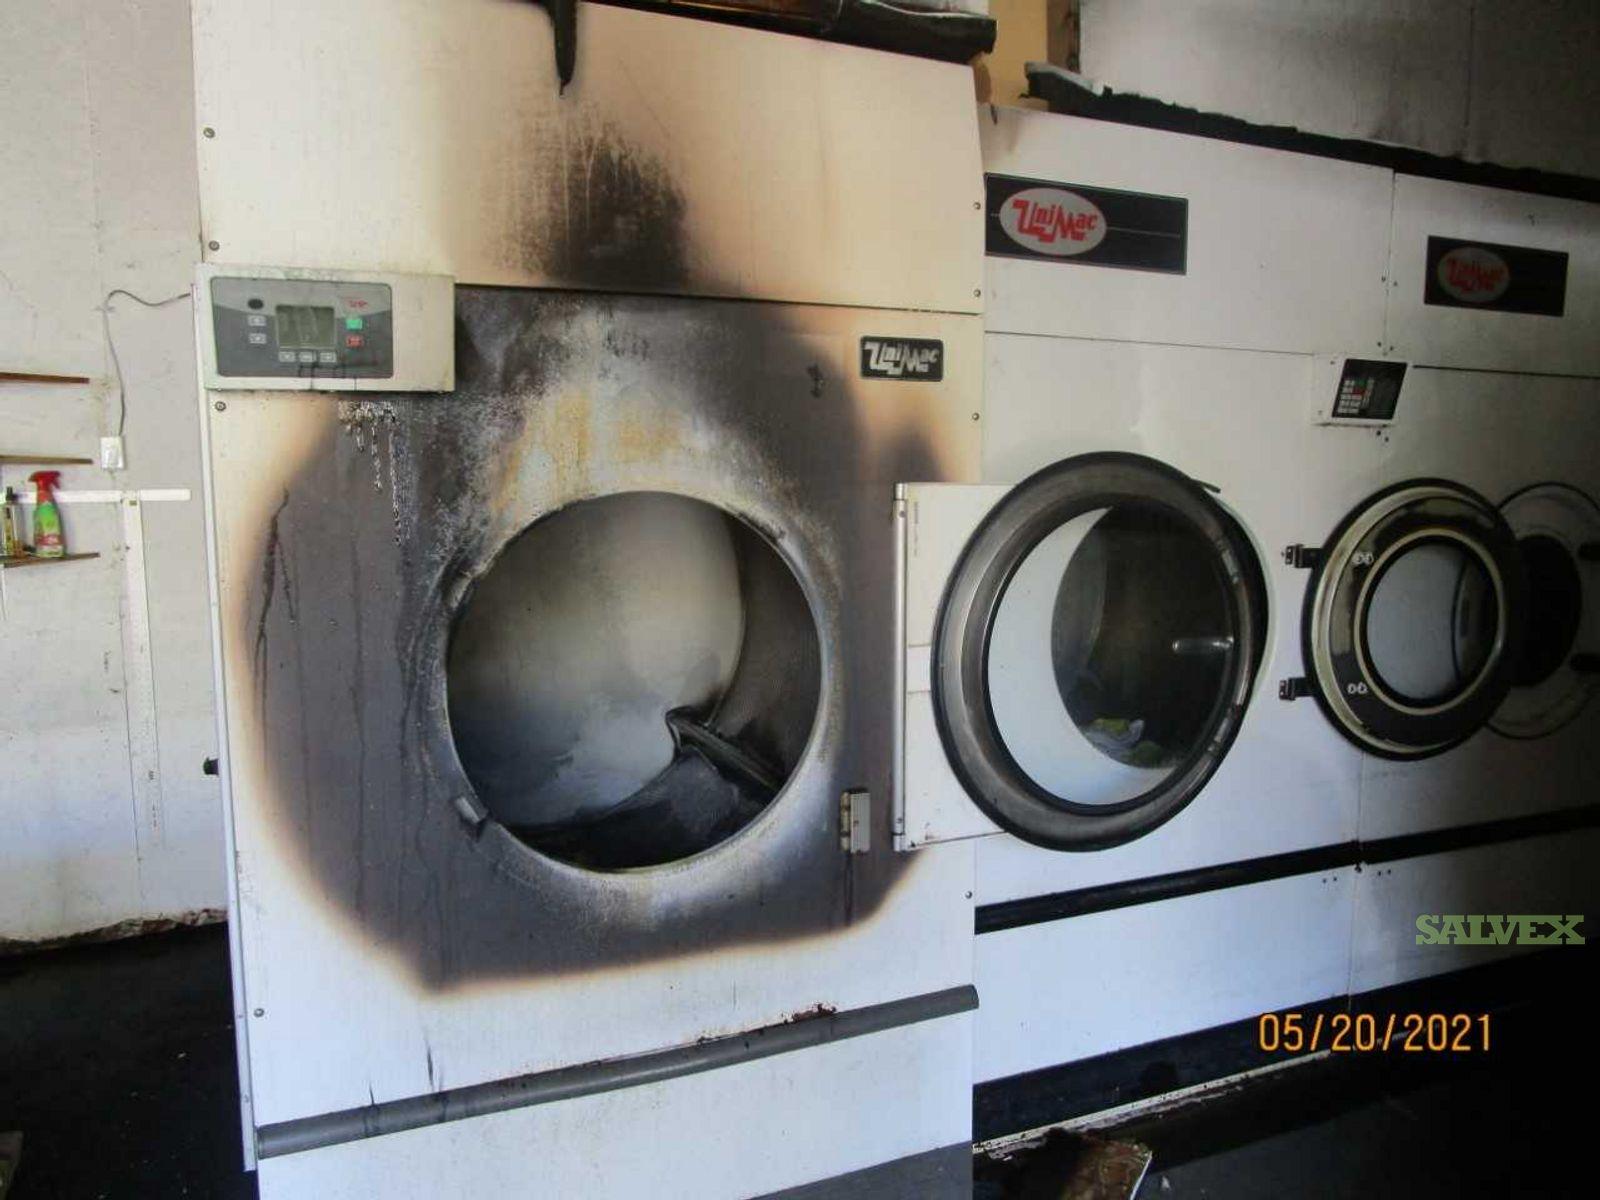 UniMac Commercial Grade Propane Operated Dryer Machine - Damaged (1 Unit)